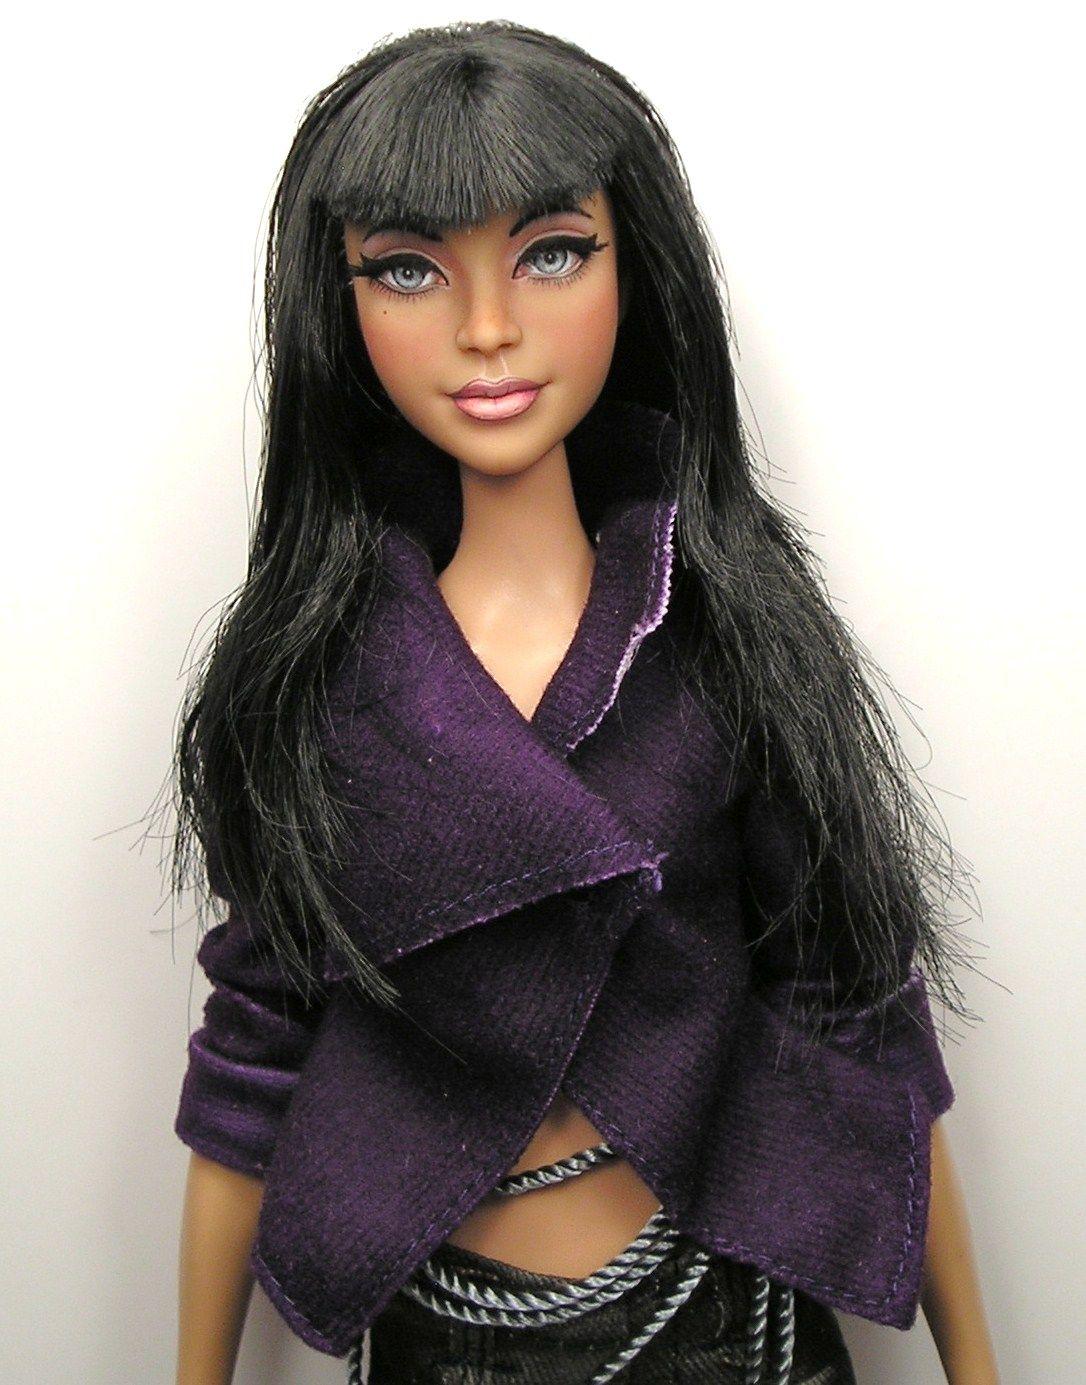 Cassie OOAK Stardoll Barbie Doll Art Custom Repaint by Artist Pamela